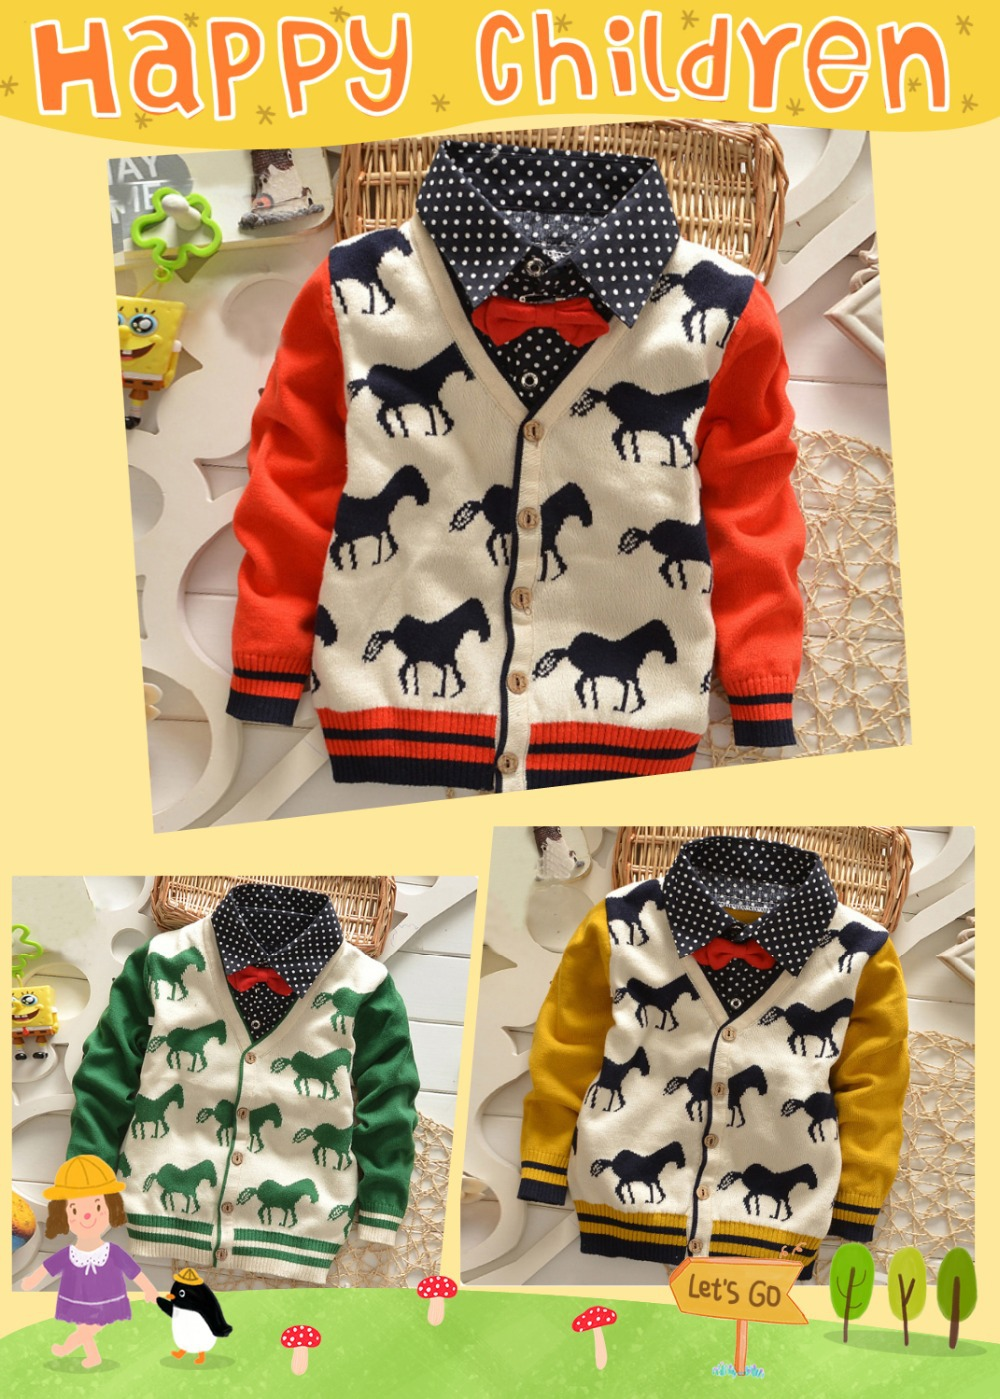 Retail 2-5Y 3cols children sweater New Autumn/Winter handsome horse pattern baby sweater woolen knitted warm baby&kids cardigan(China (Mainland))